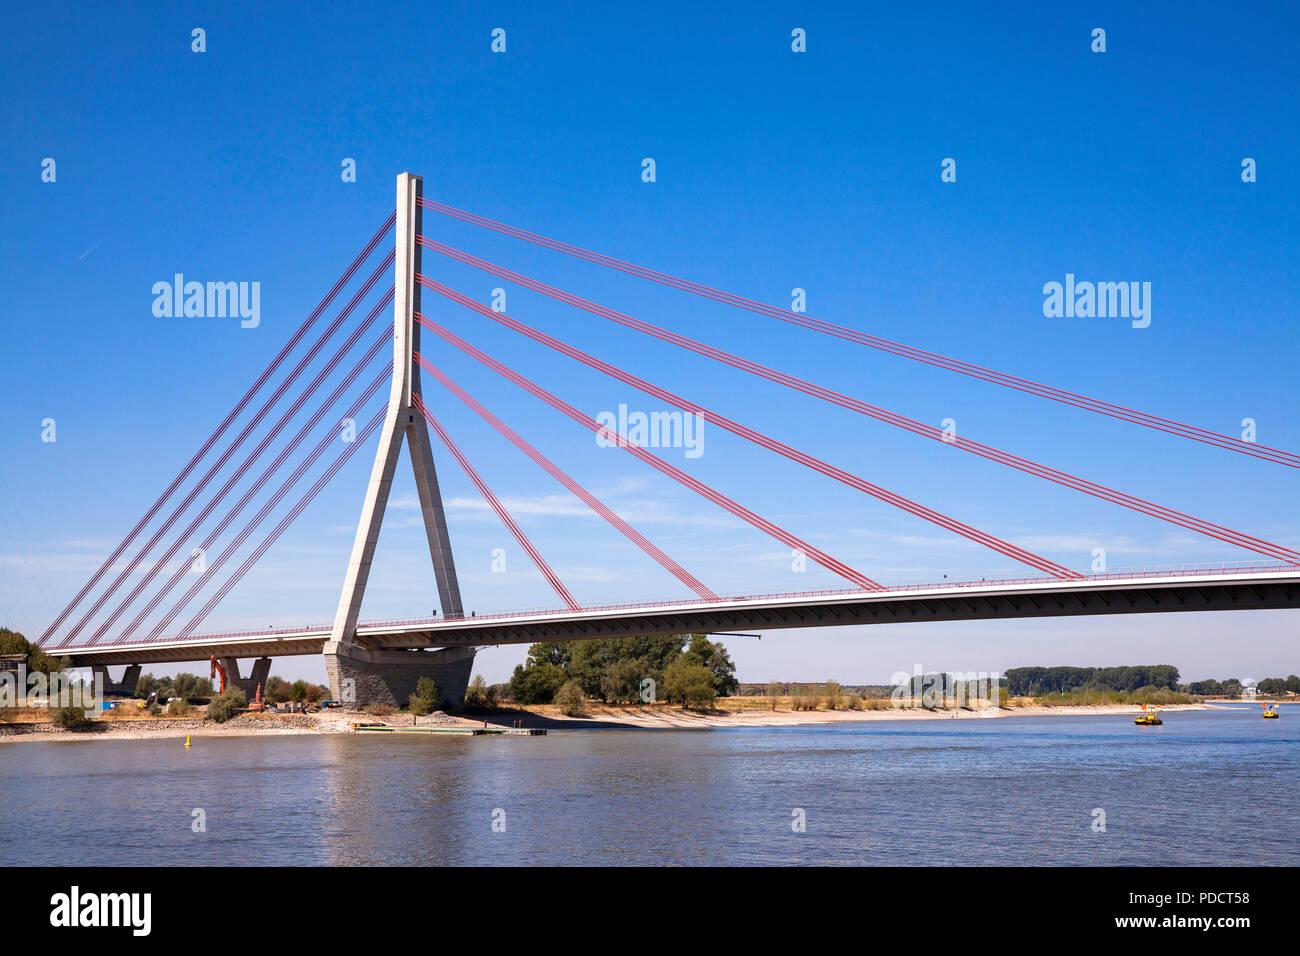 the Niederrhein bridge across the river Rhine, Wesel, Germany.  die Niederrheinbruecke ueber den Rhein, Wesel, Deutschland. - Stock Image